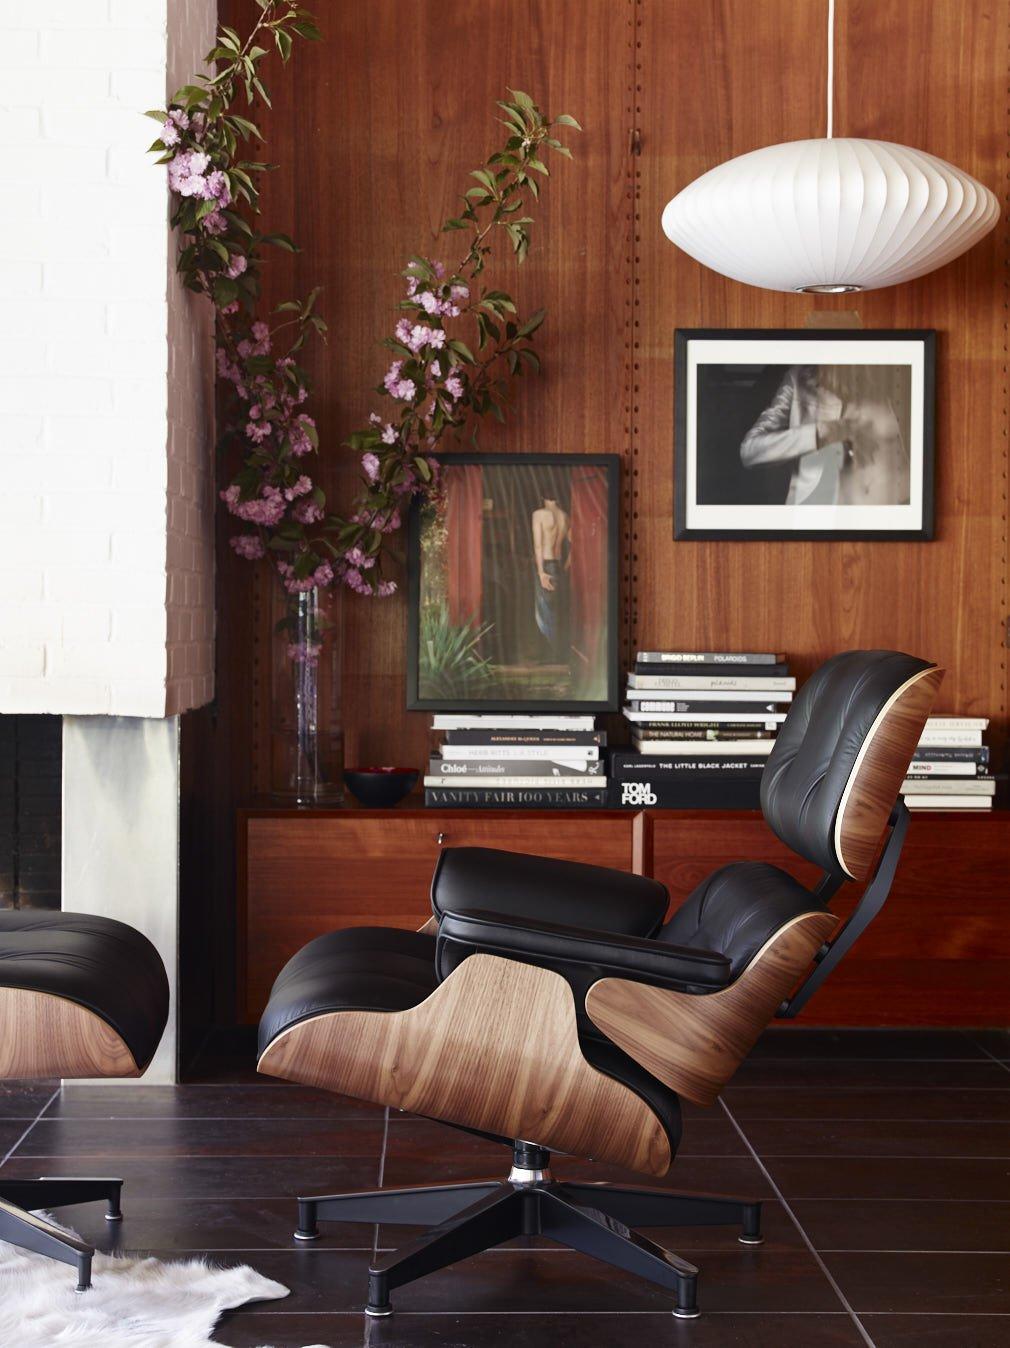 Кресло Eames Lounge Chair. Дизайн Чарльза и Рэй Имз для Herman Miller